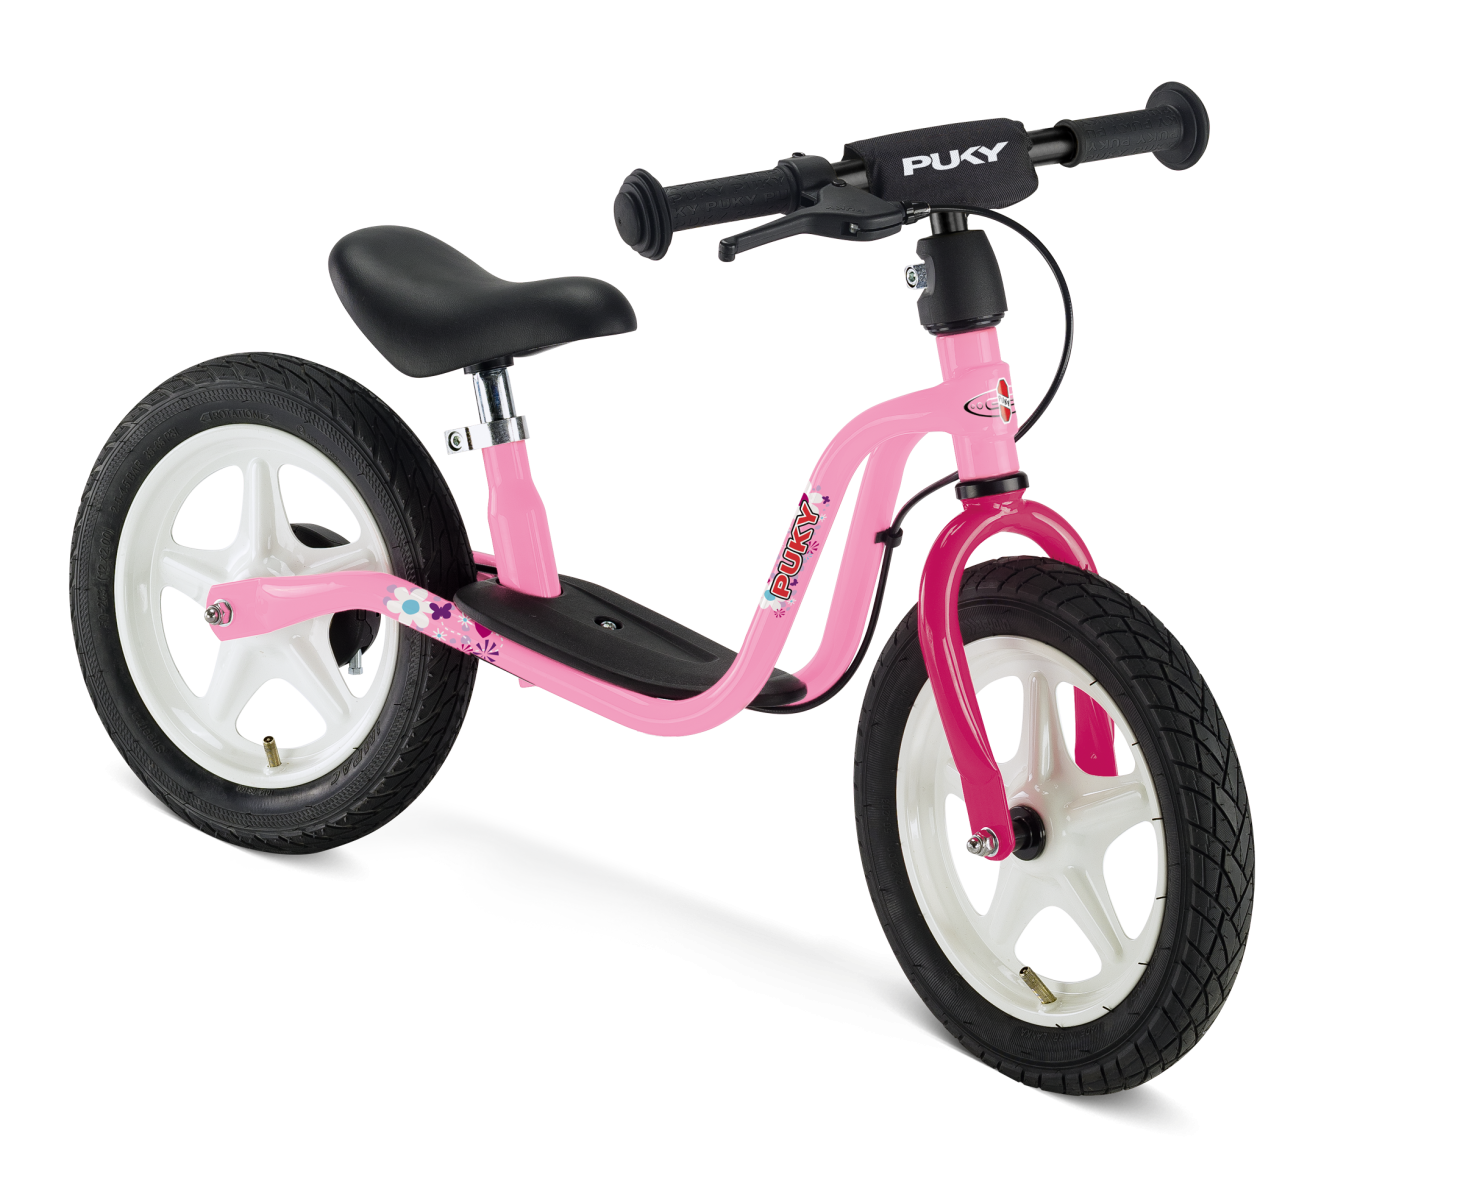 Puky - Balance Bike - LR 1 L Br - Pink (4065)